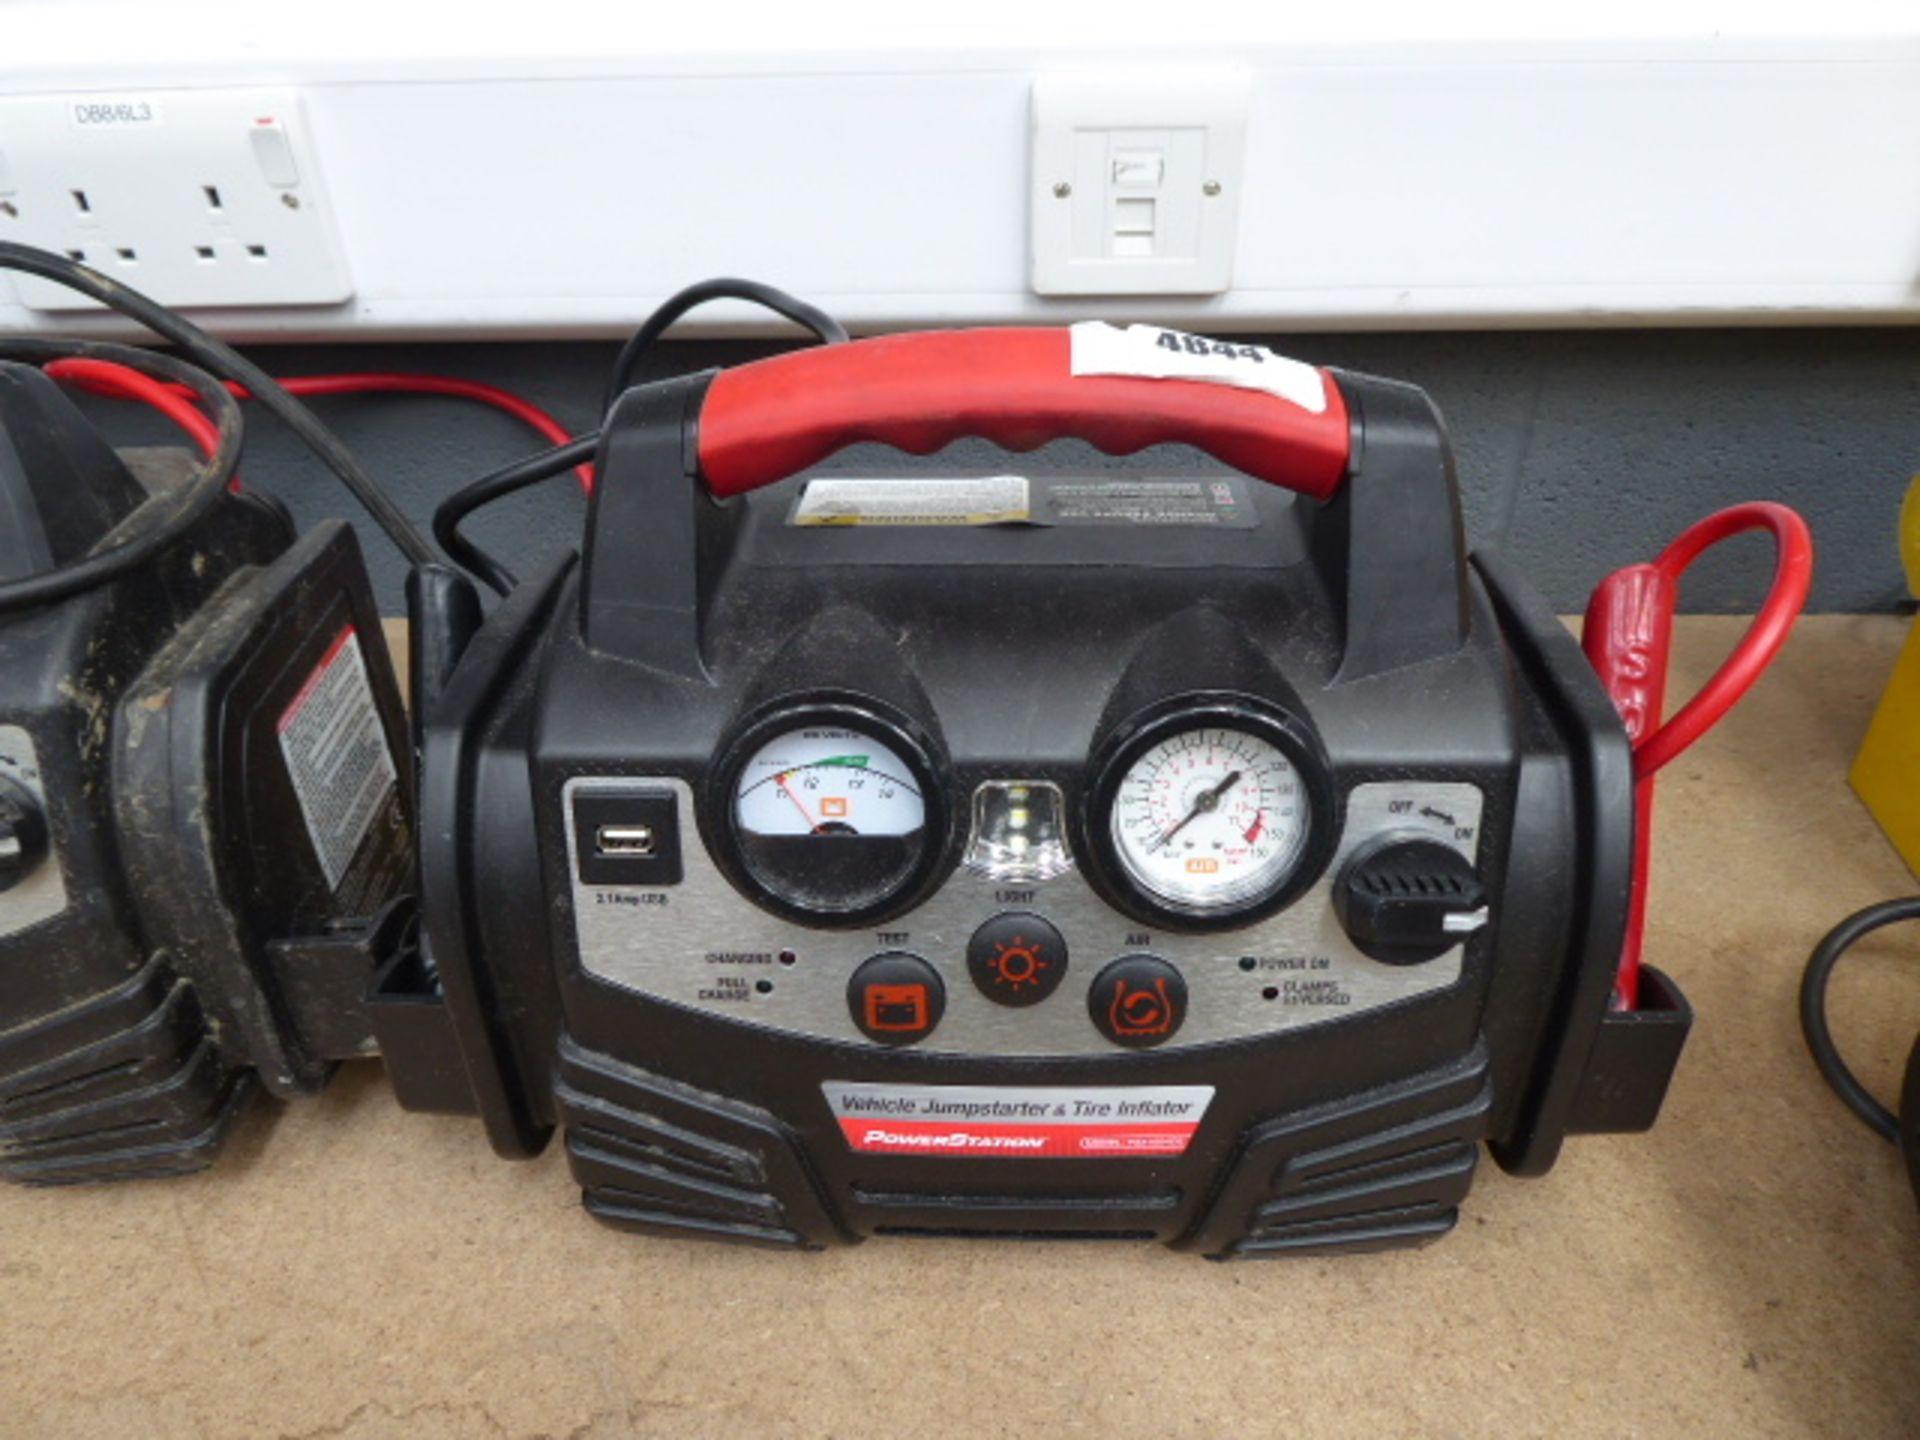 Lot 4844 - 4451 PSX jumpstart kit (no charger)